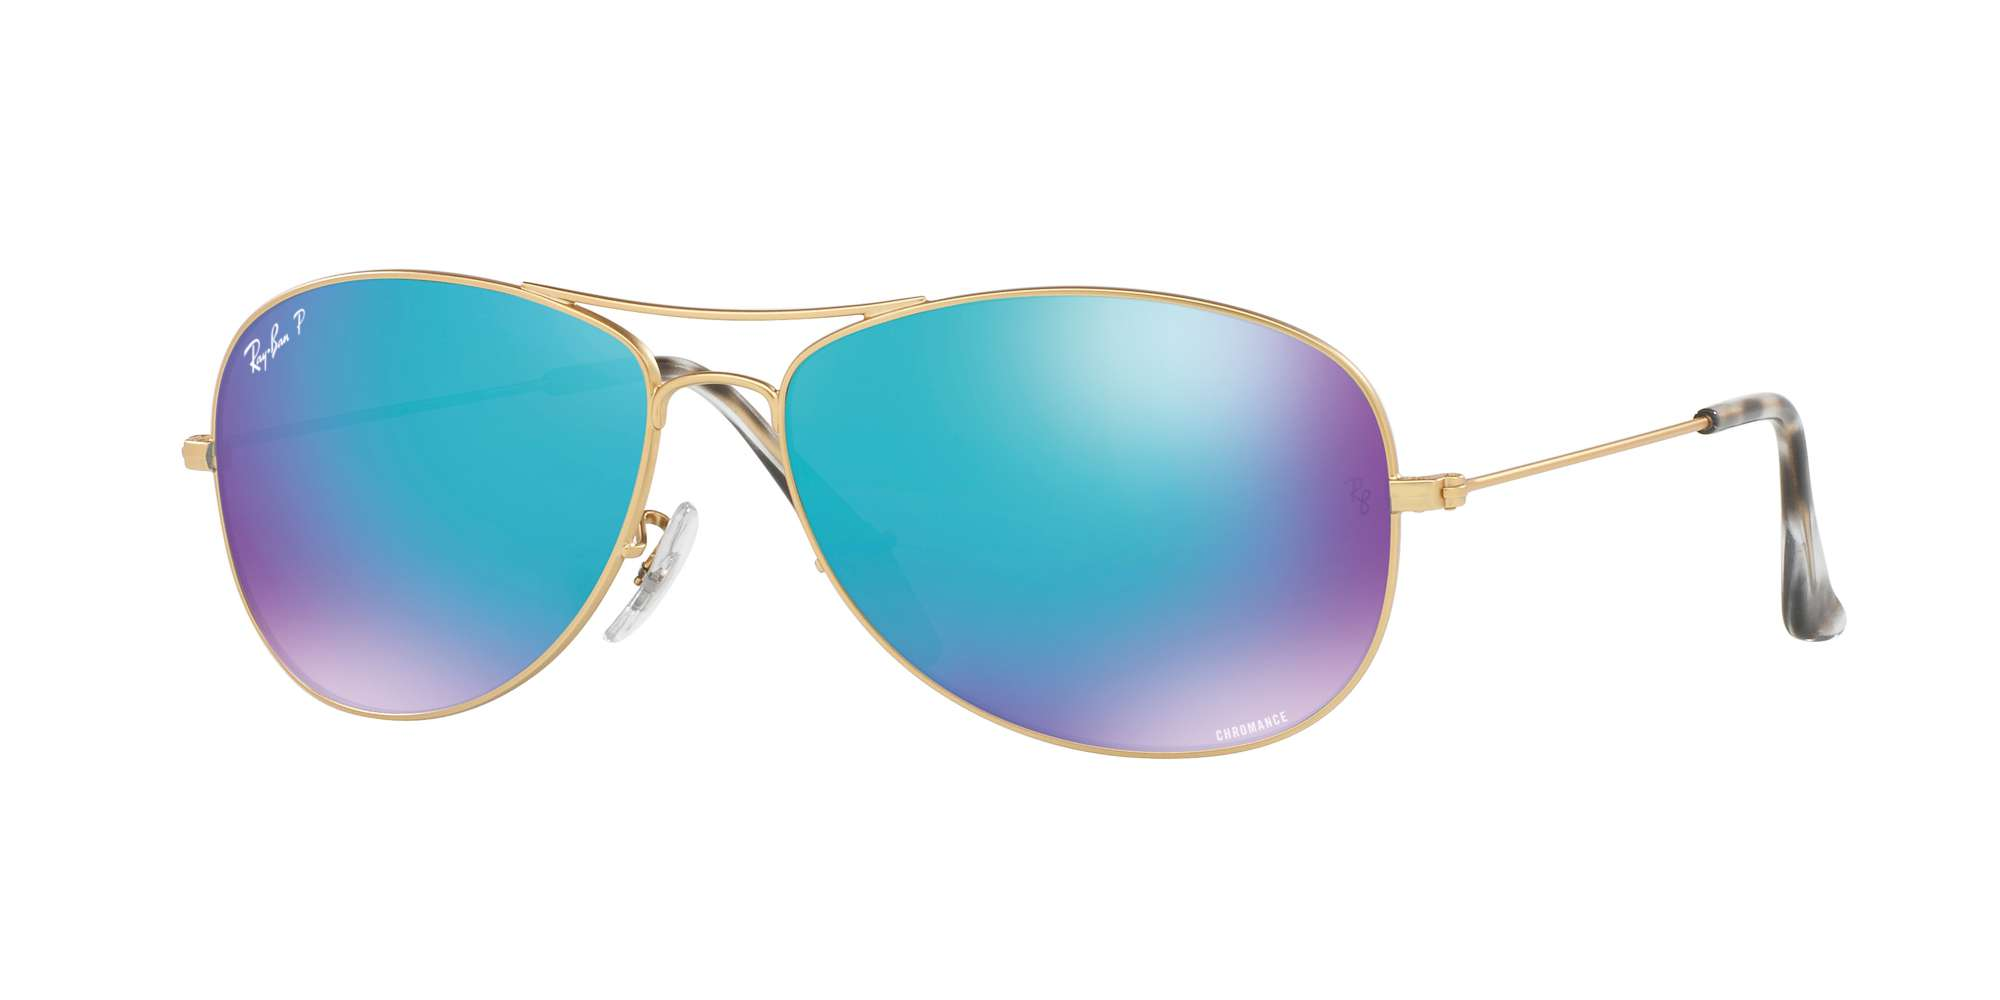 MATTE GOLD / BLUE POLAR FLASH lenses